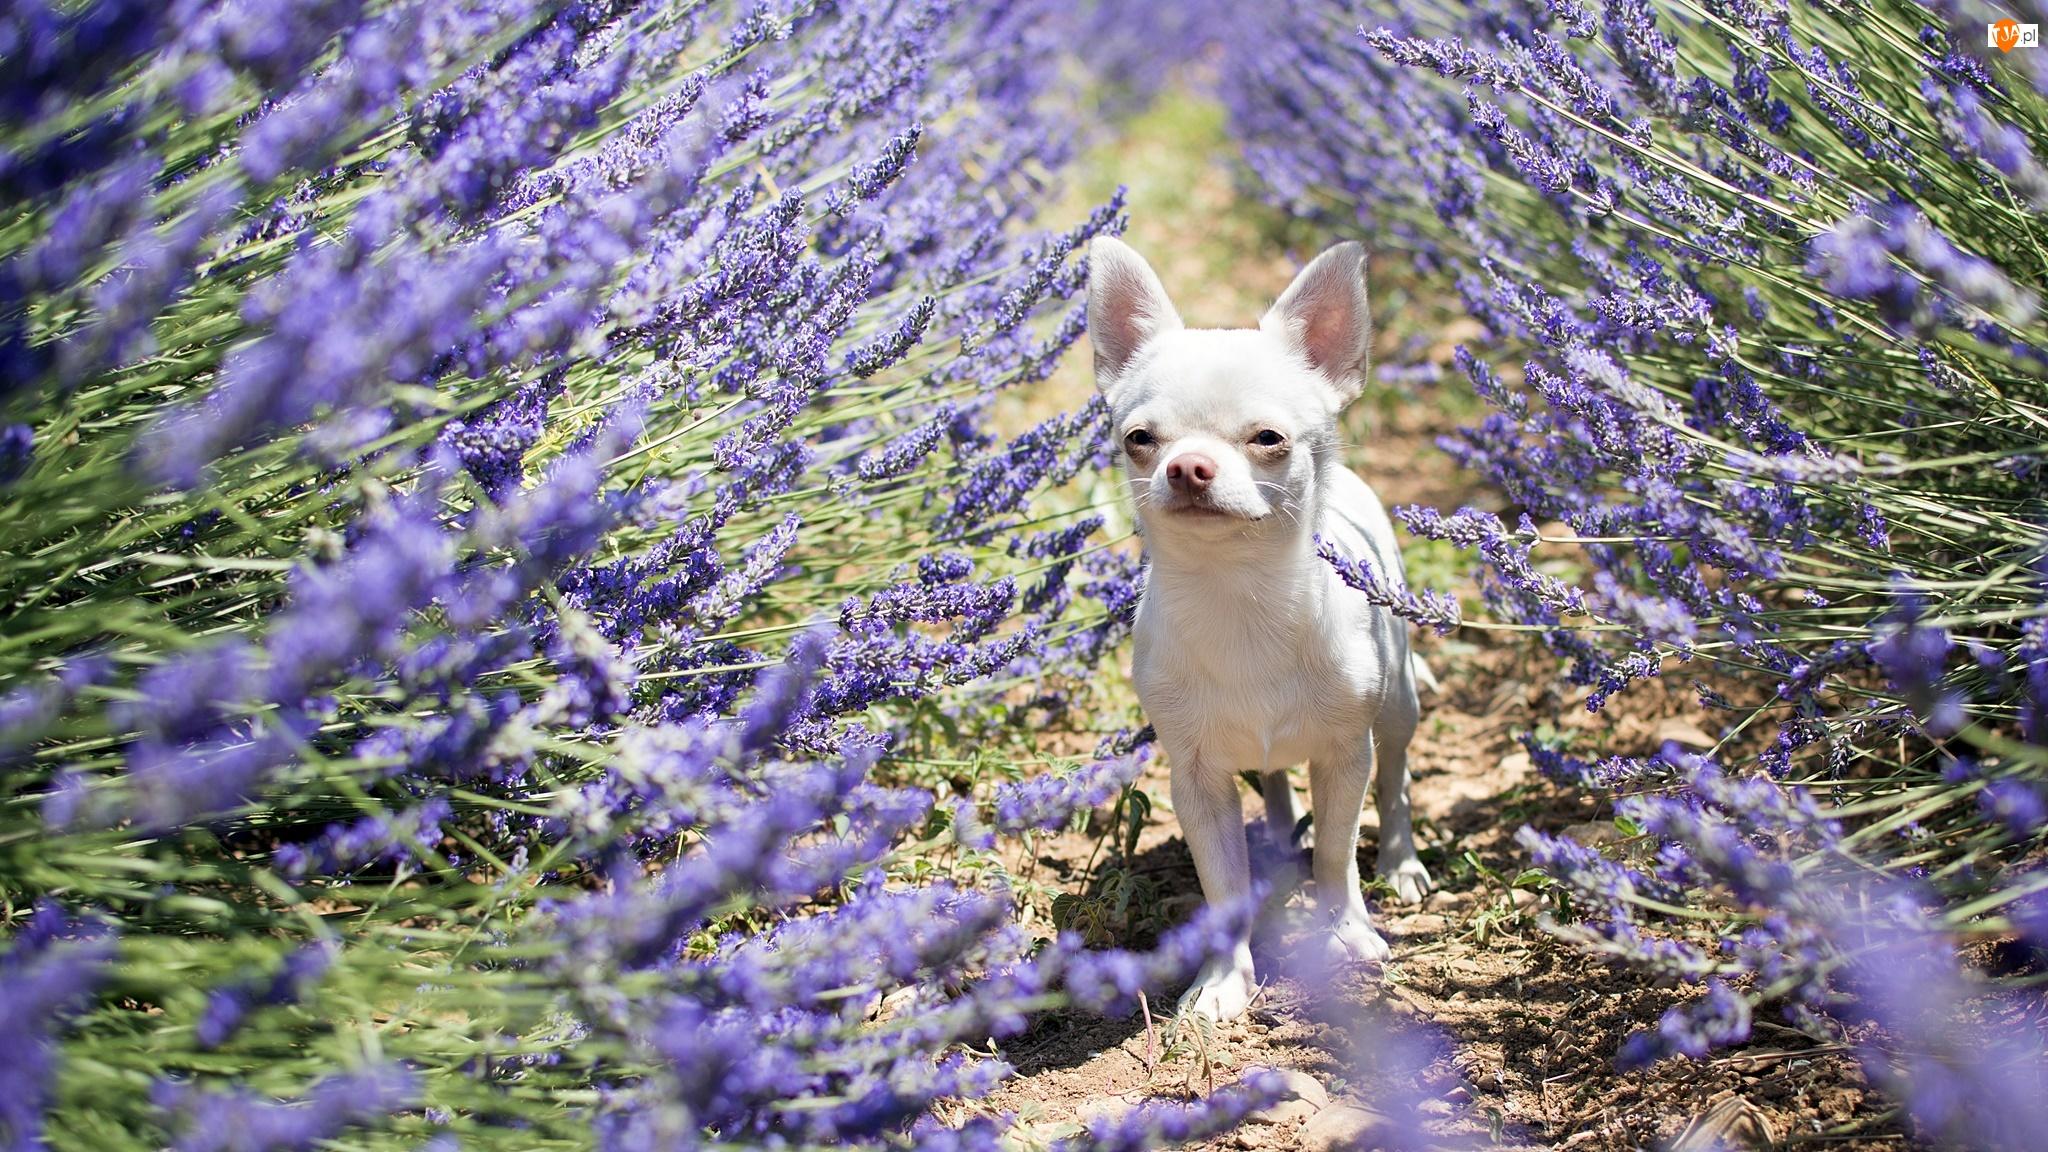 Lawenda, Pies, Chihuahua krótkowłosa